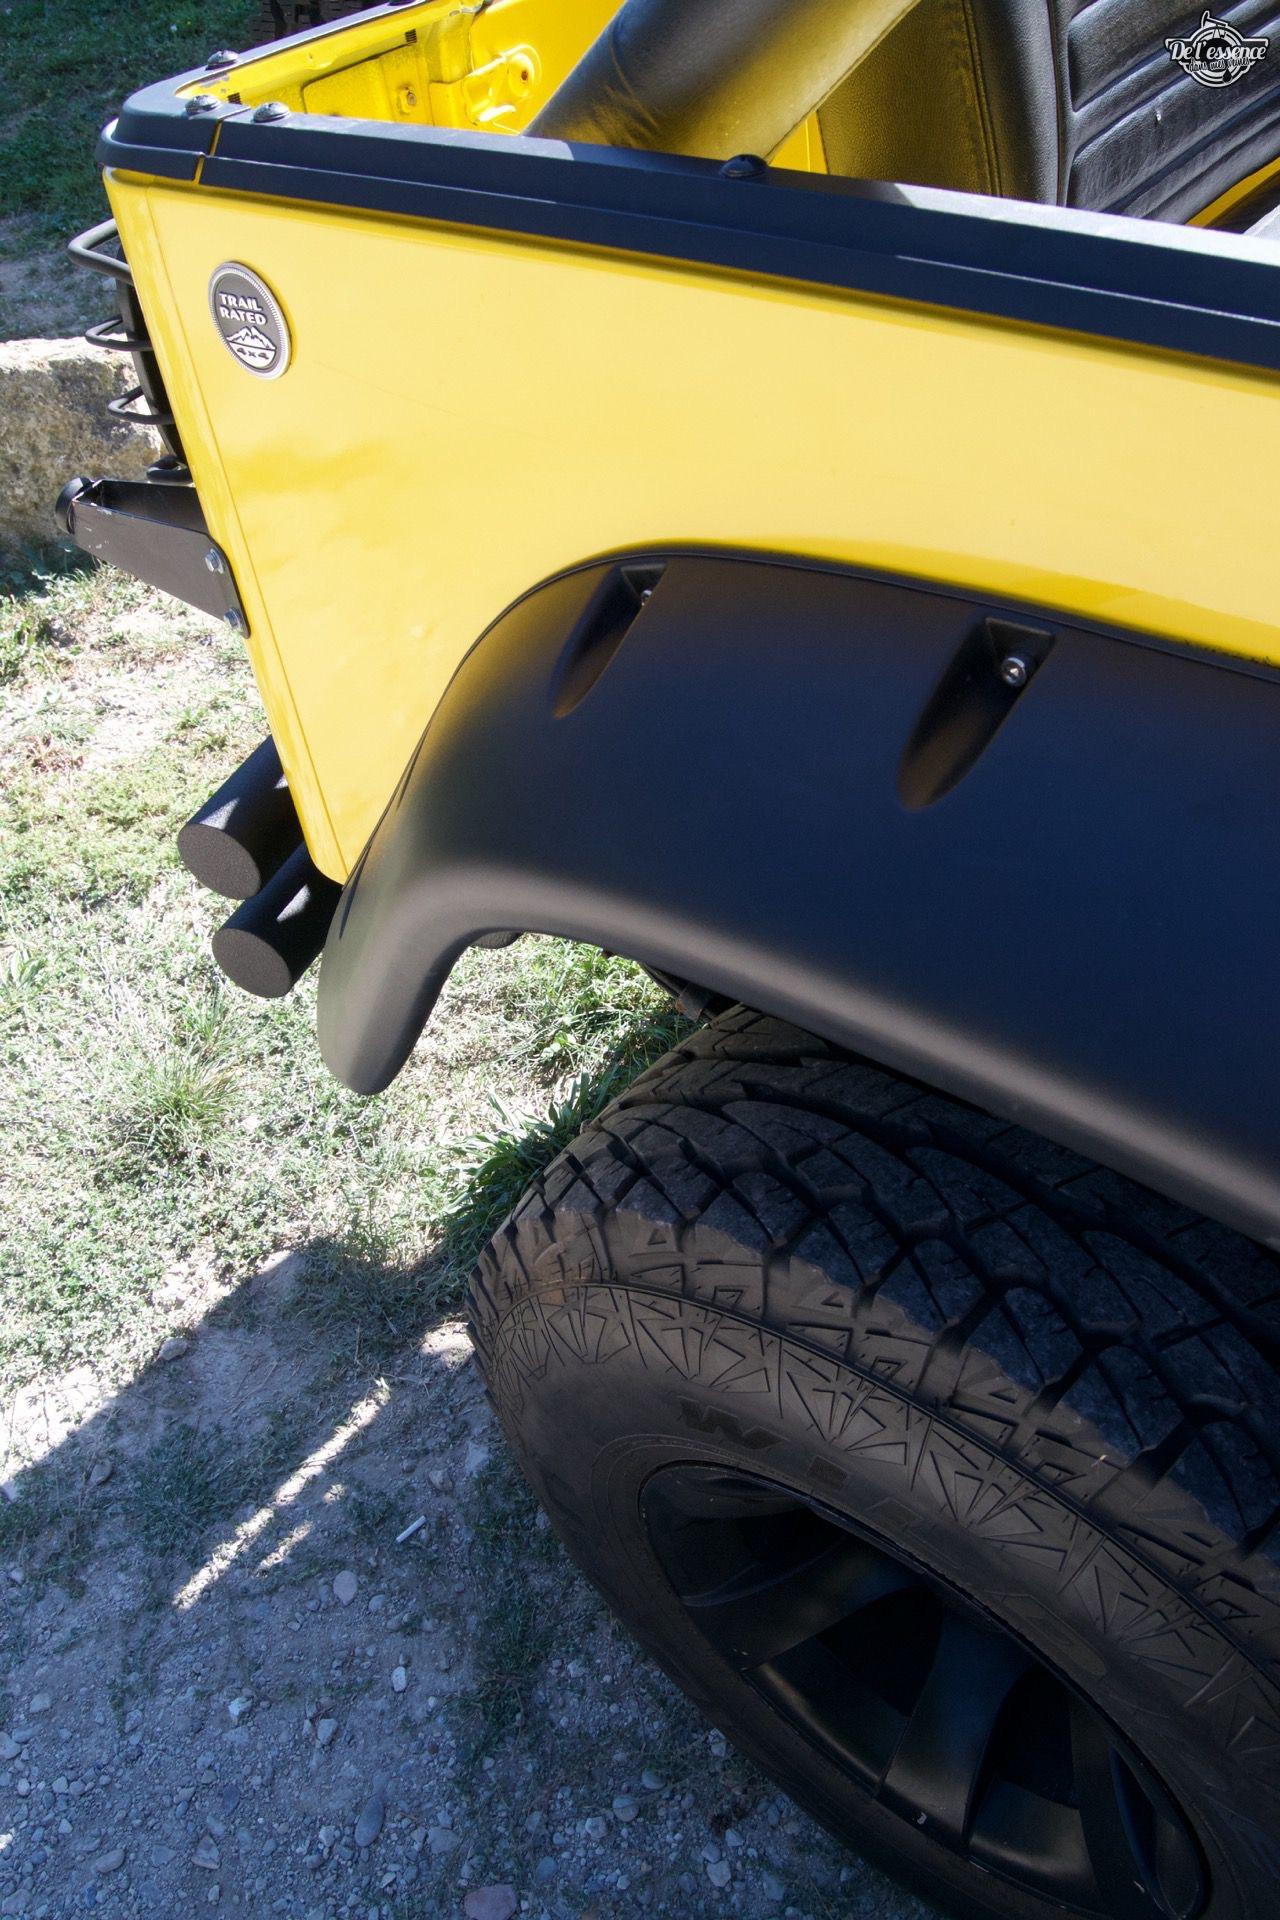 '82 Jeep CJ-7 Laredo - Quand tu te fais chier sur la route... 59